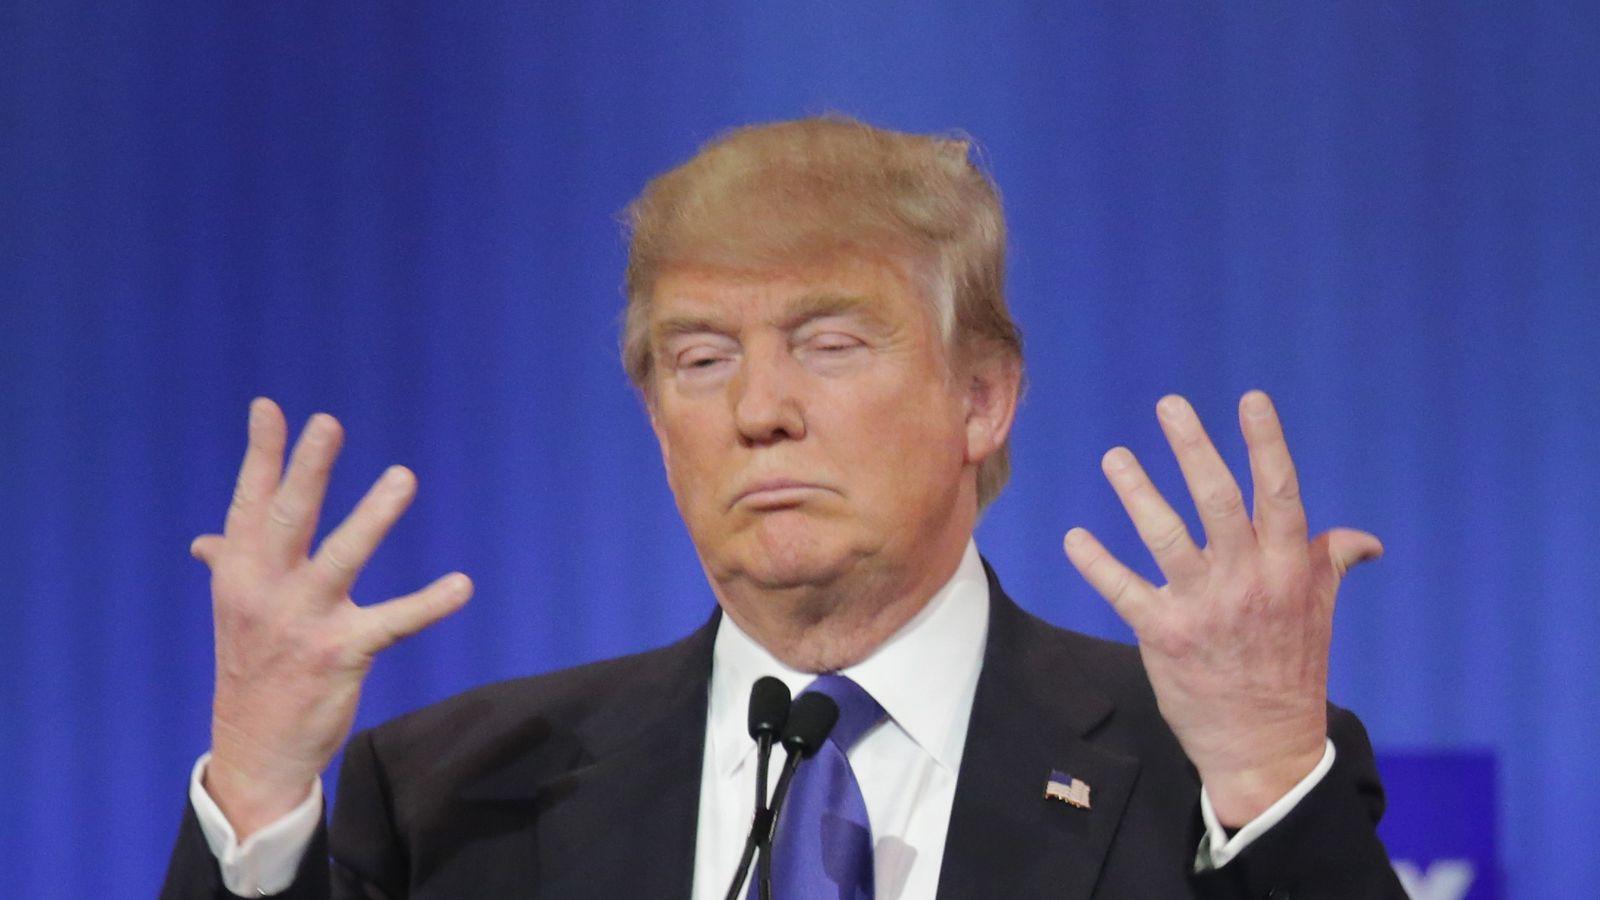 Donald Trump Just Defended His Penis Size At The Republican Debate - Vox-6036